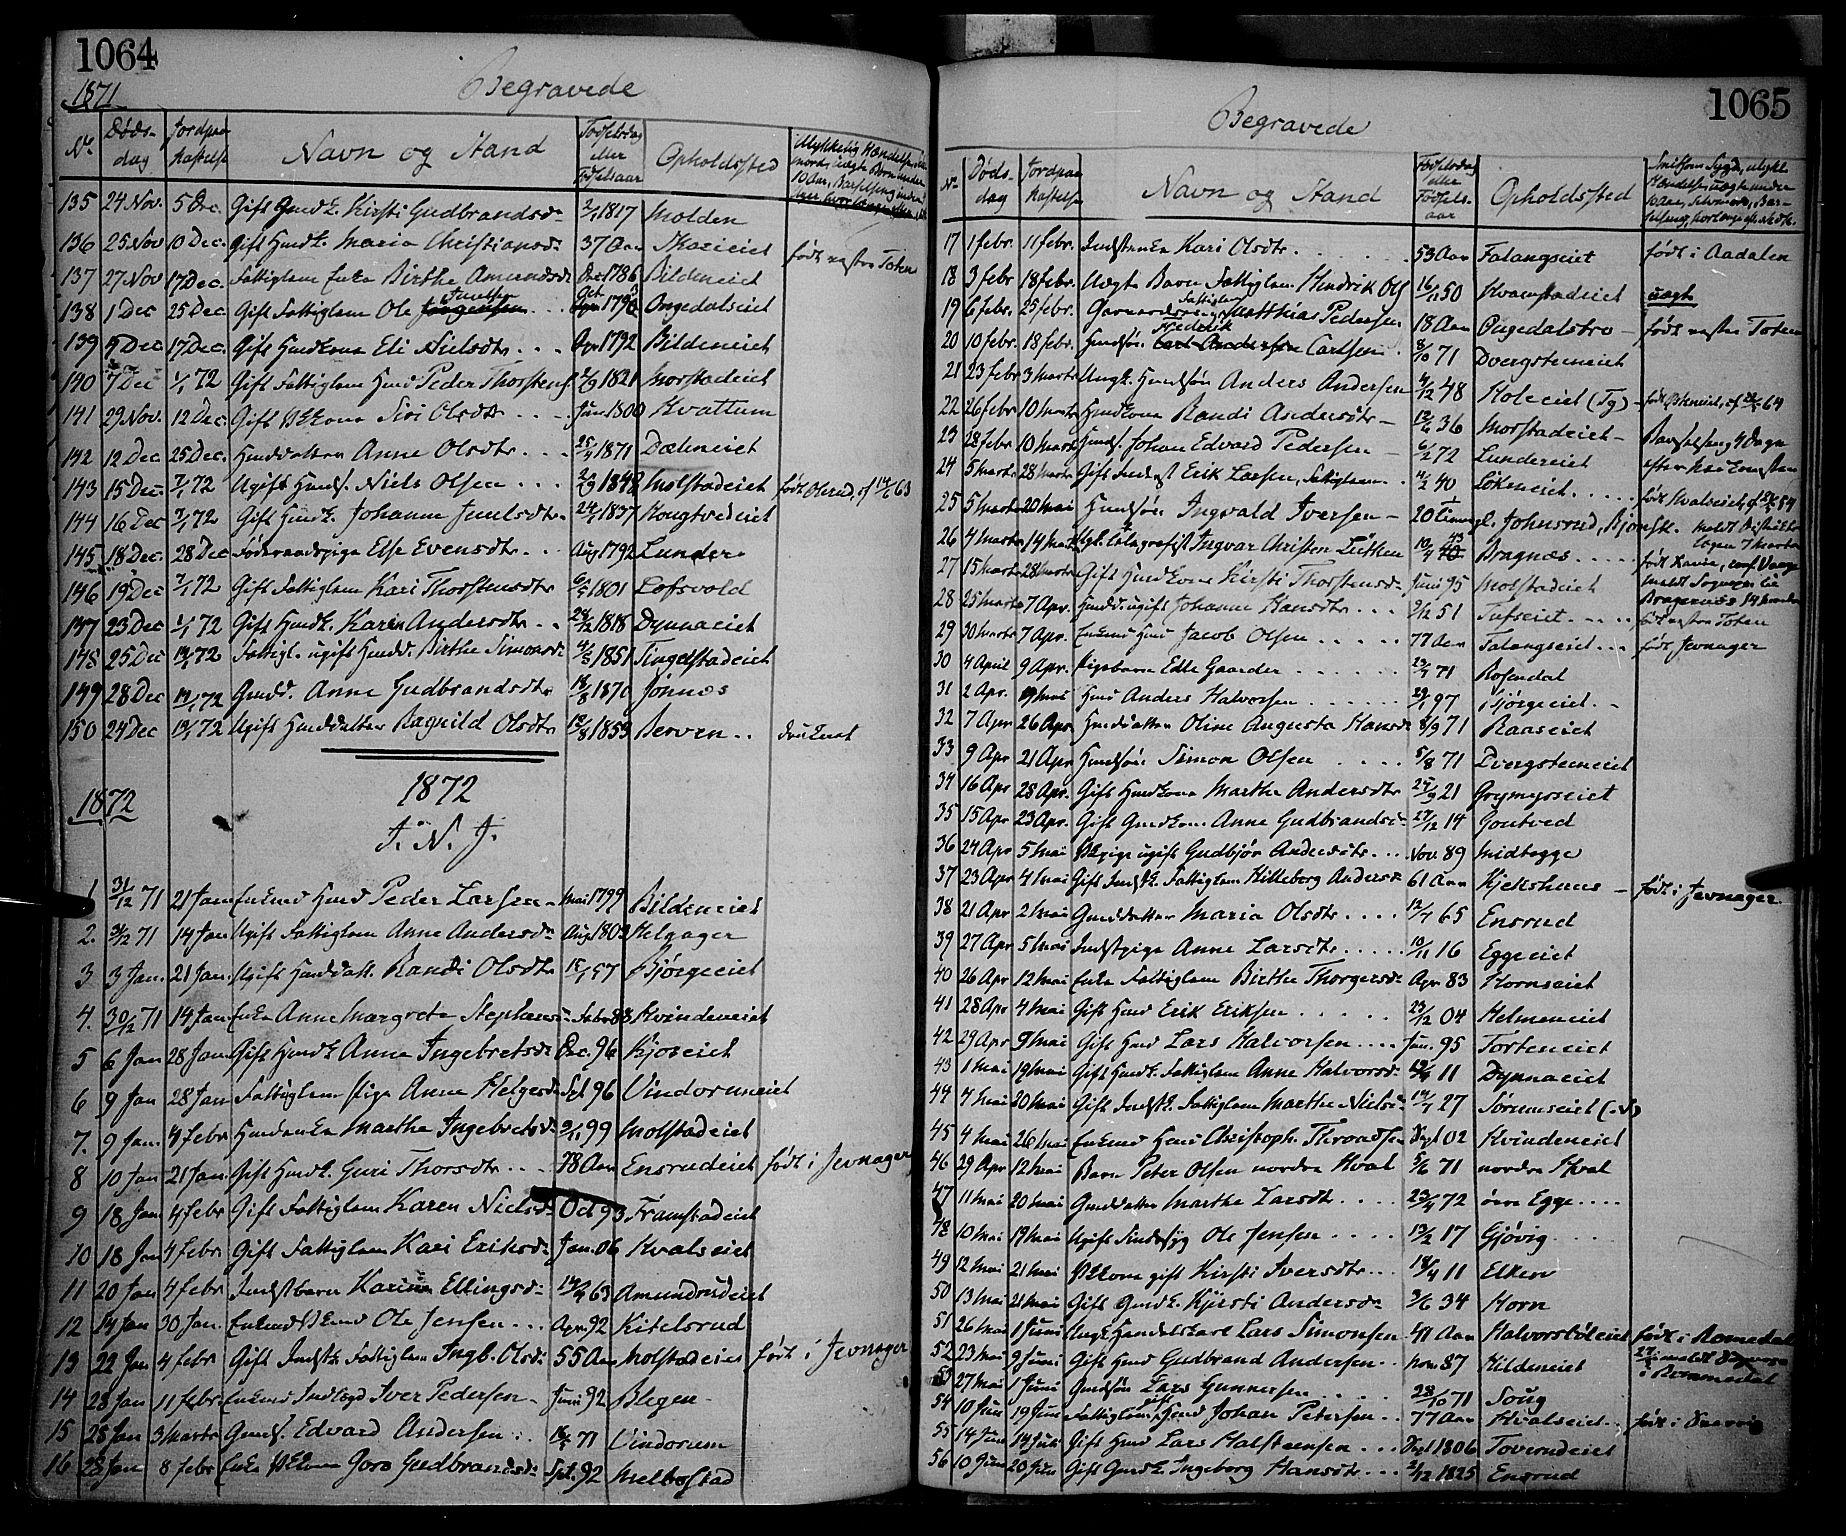 SAH, Gran prestekontor, Ministerialbok nr. 12, 1856-1874, s. 1064-1065